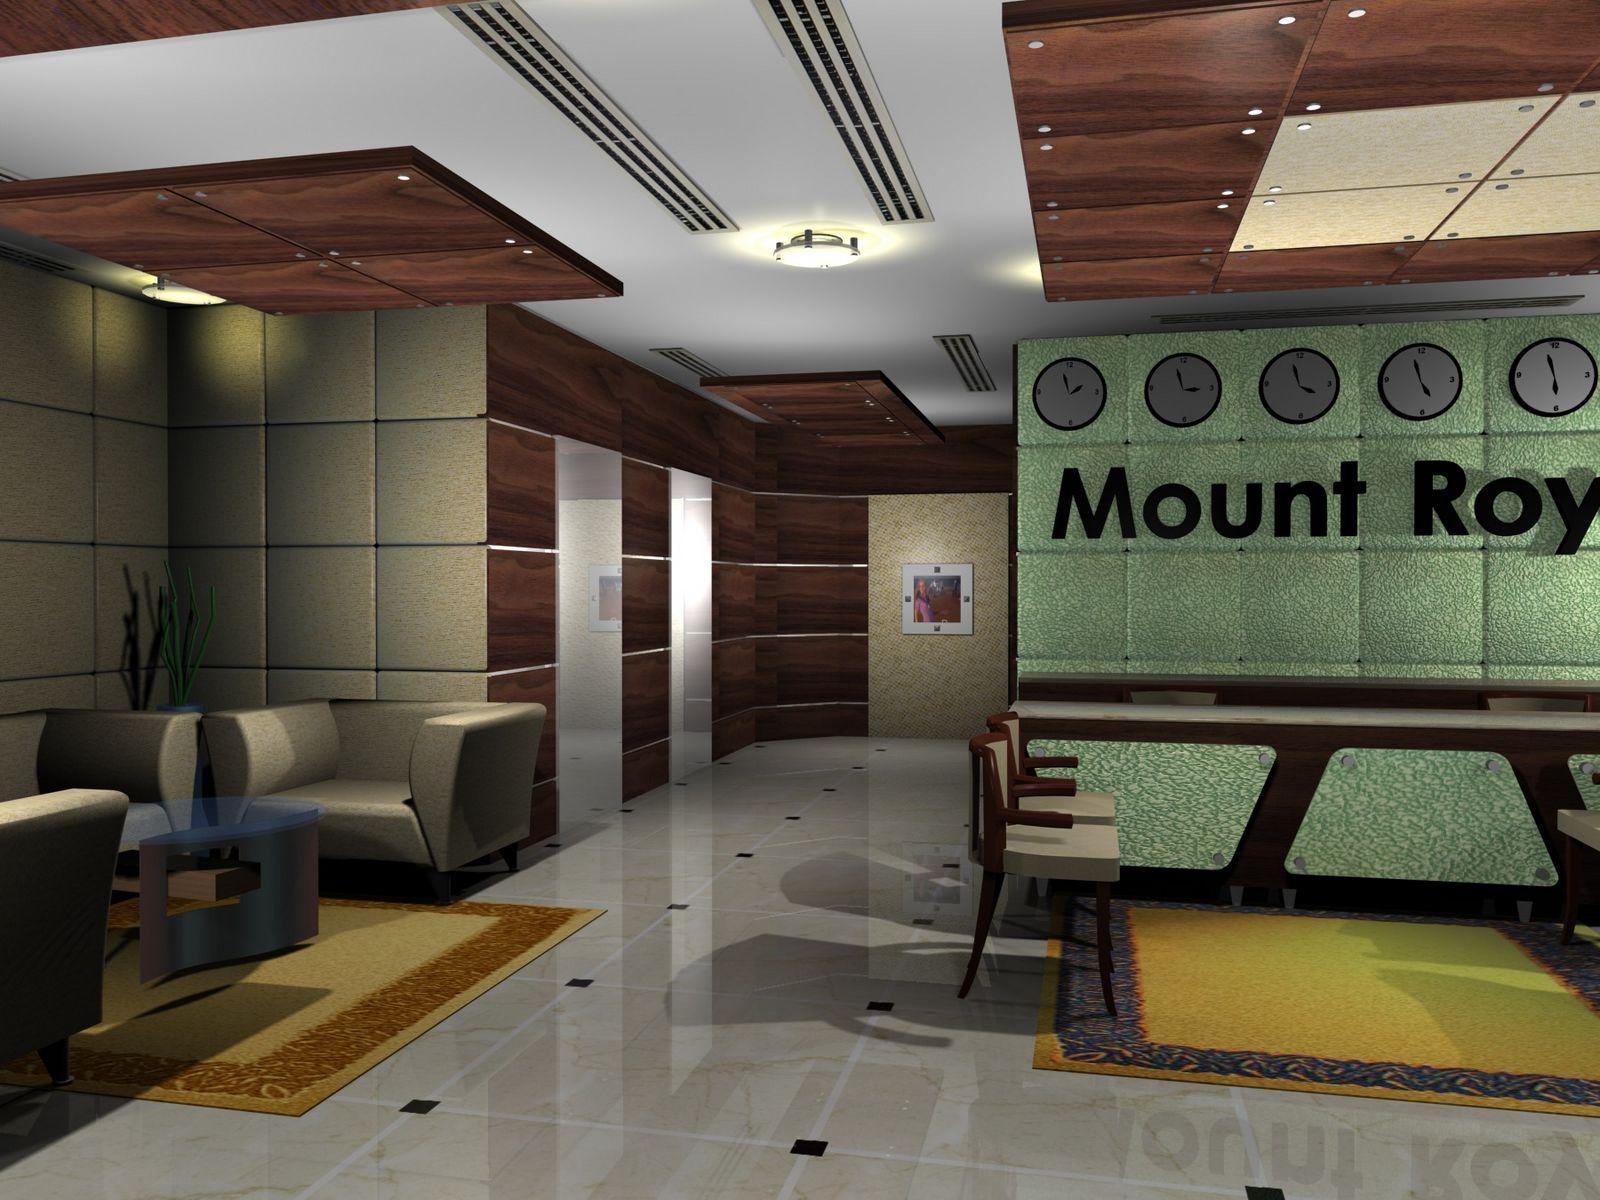 24 amazing hotel lobbies design tierra este 82347 Small hotel lobby